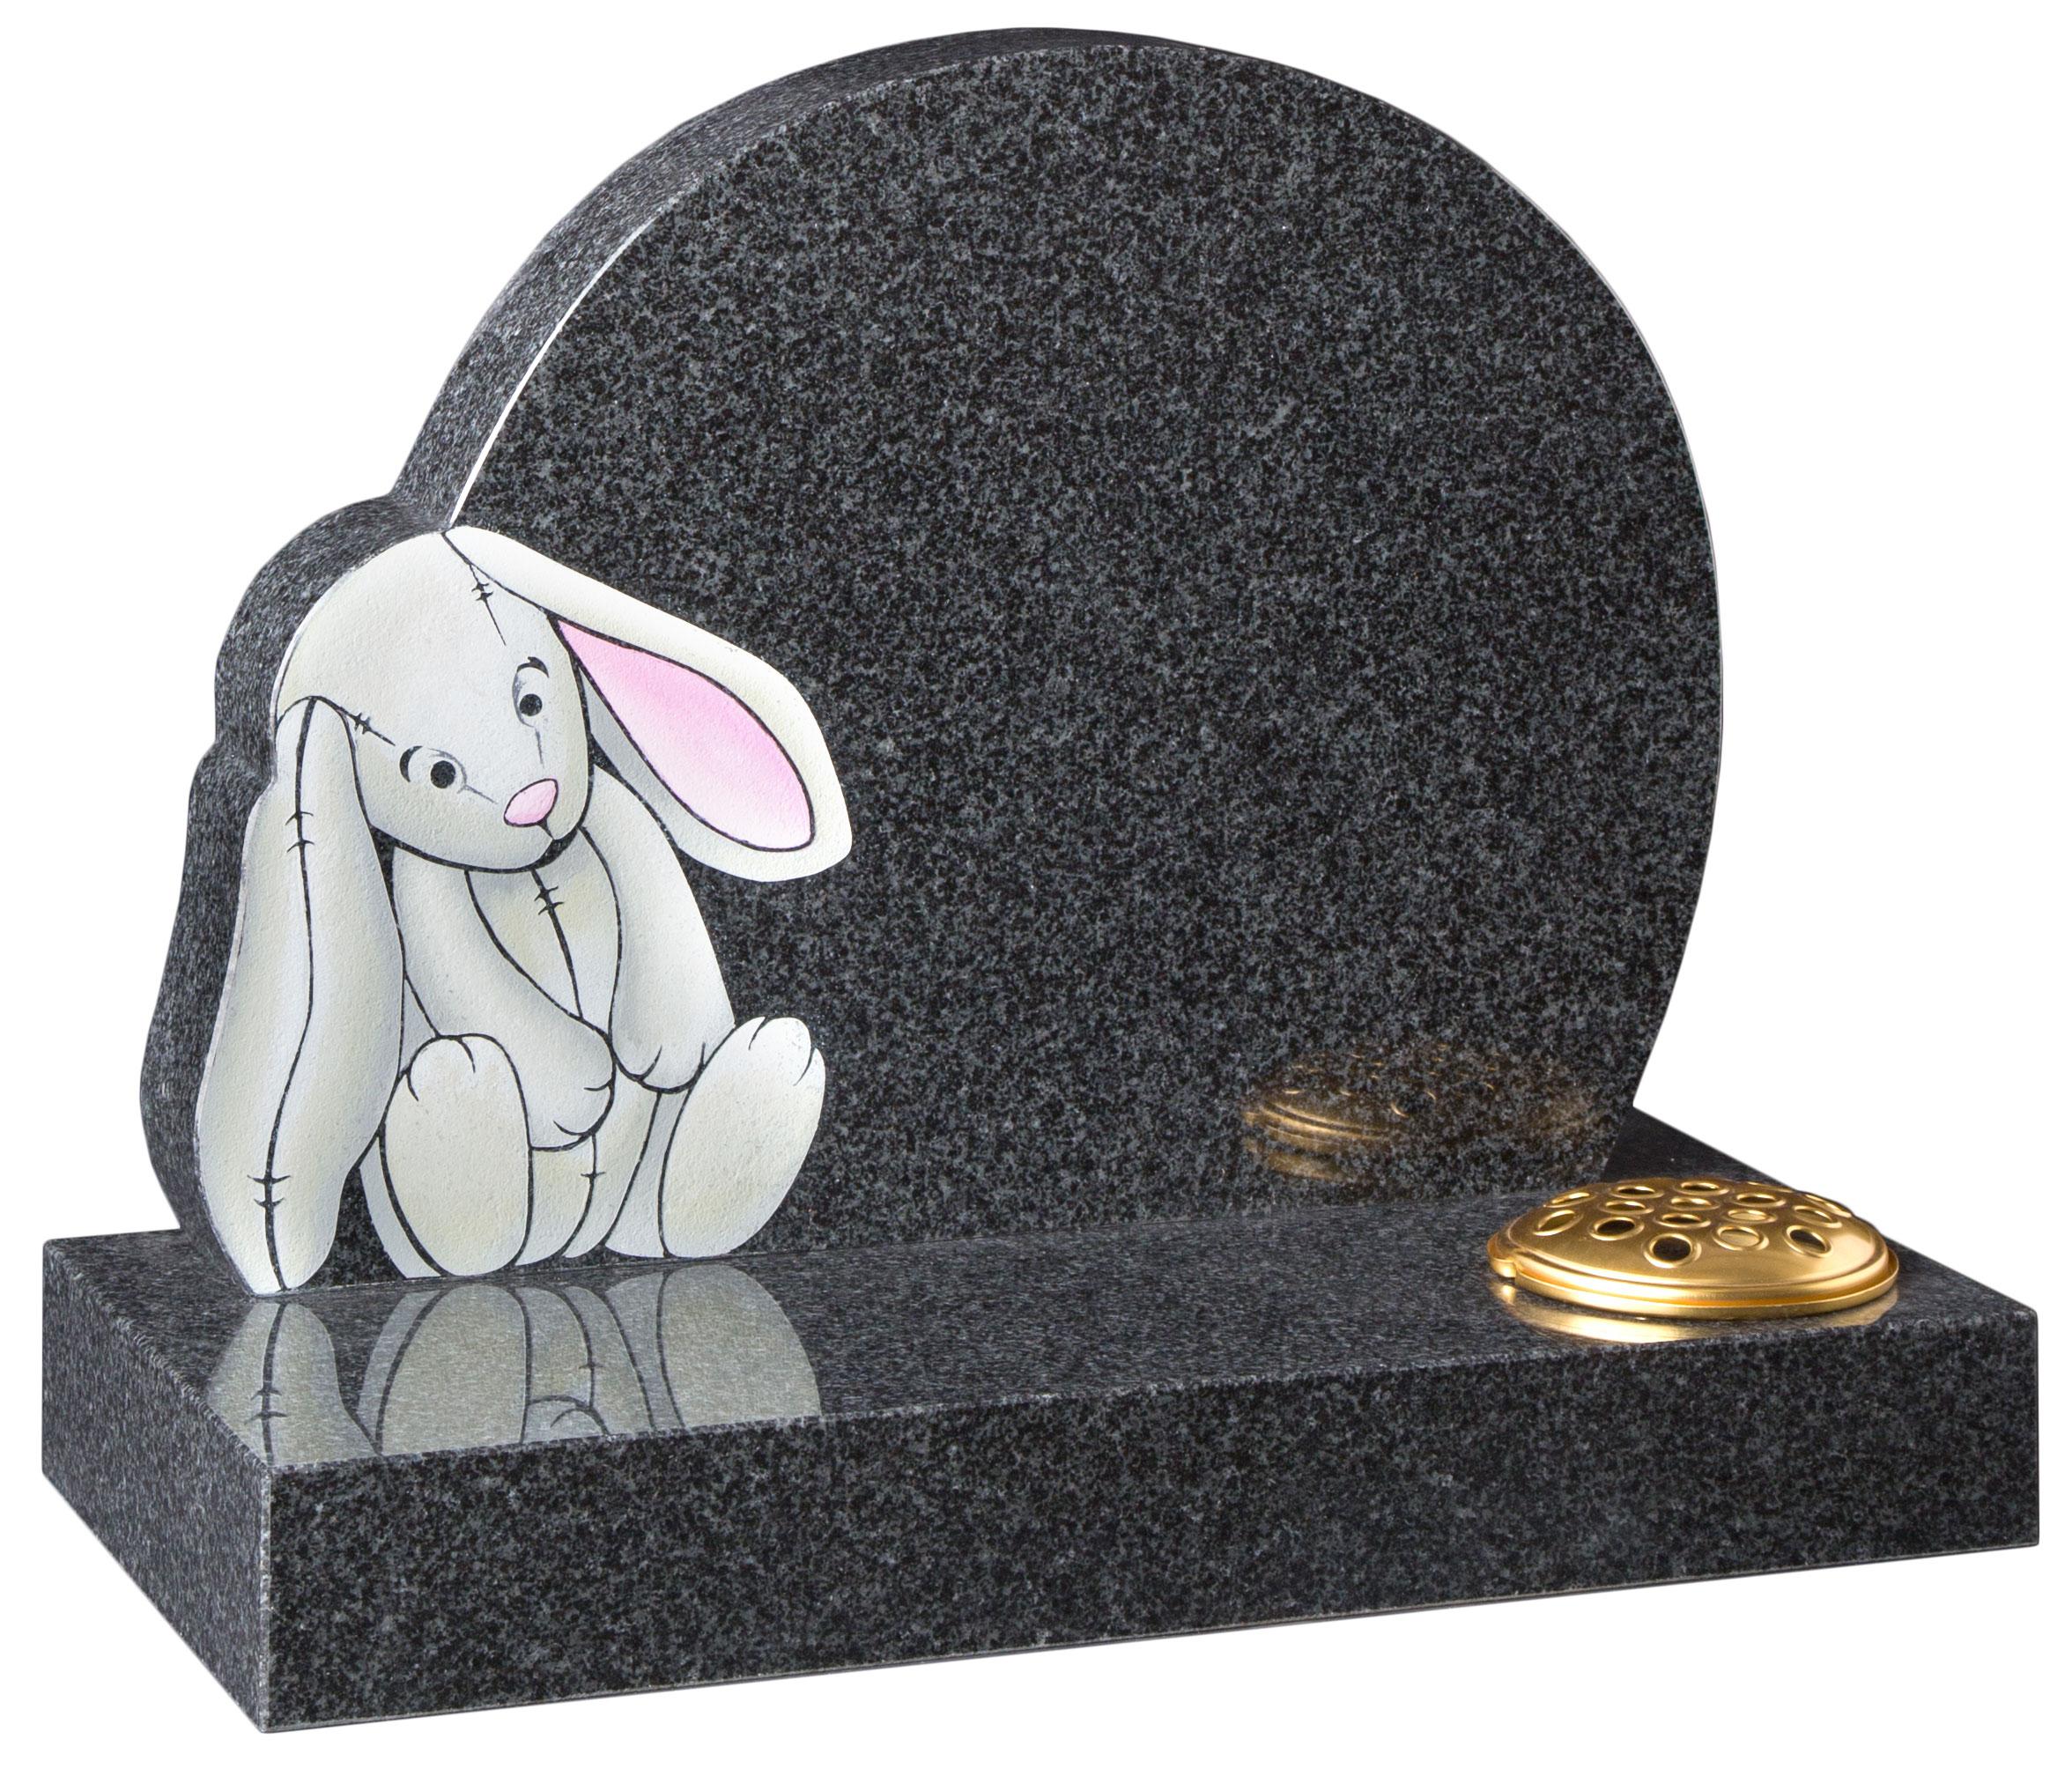 16176 Circular headstone